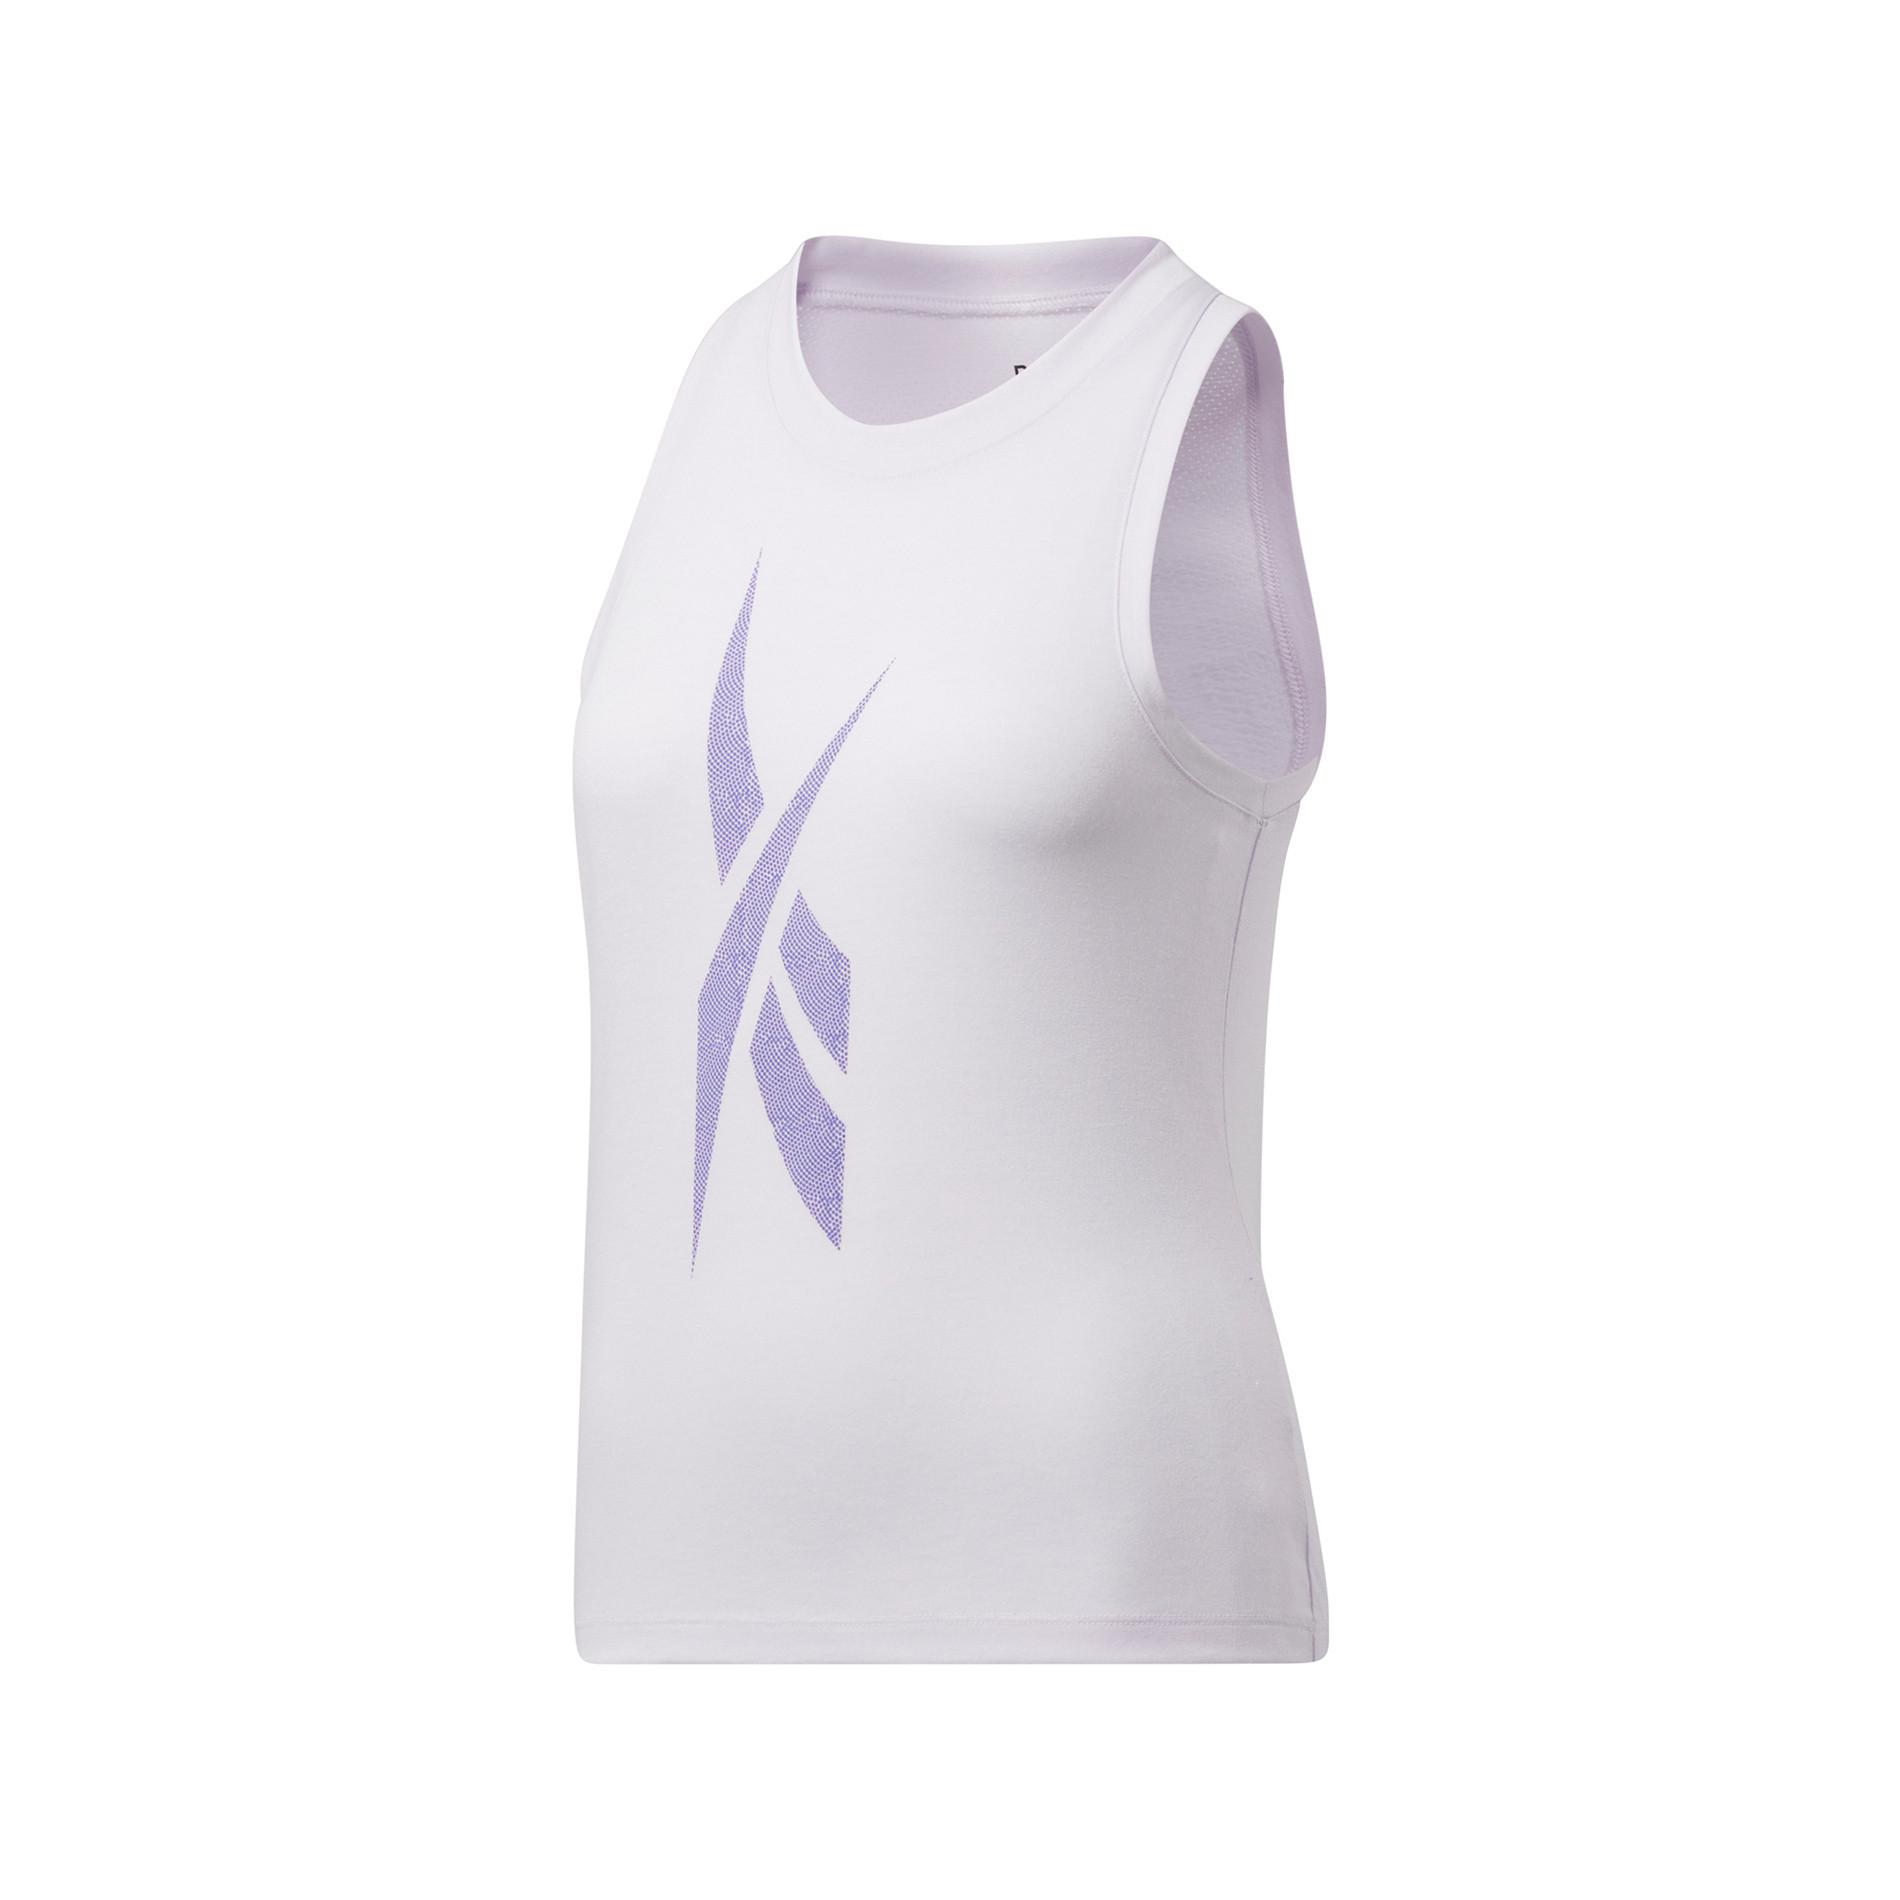 Canotta workout traspirante, Bianco, large image number 0